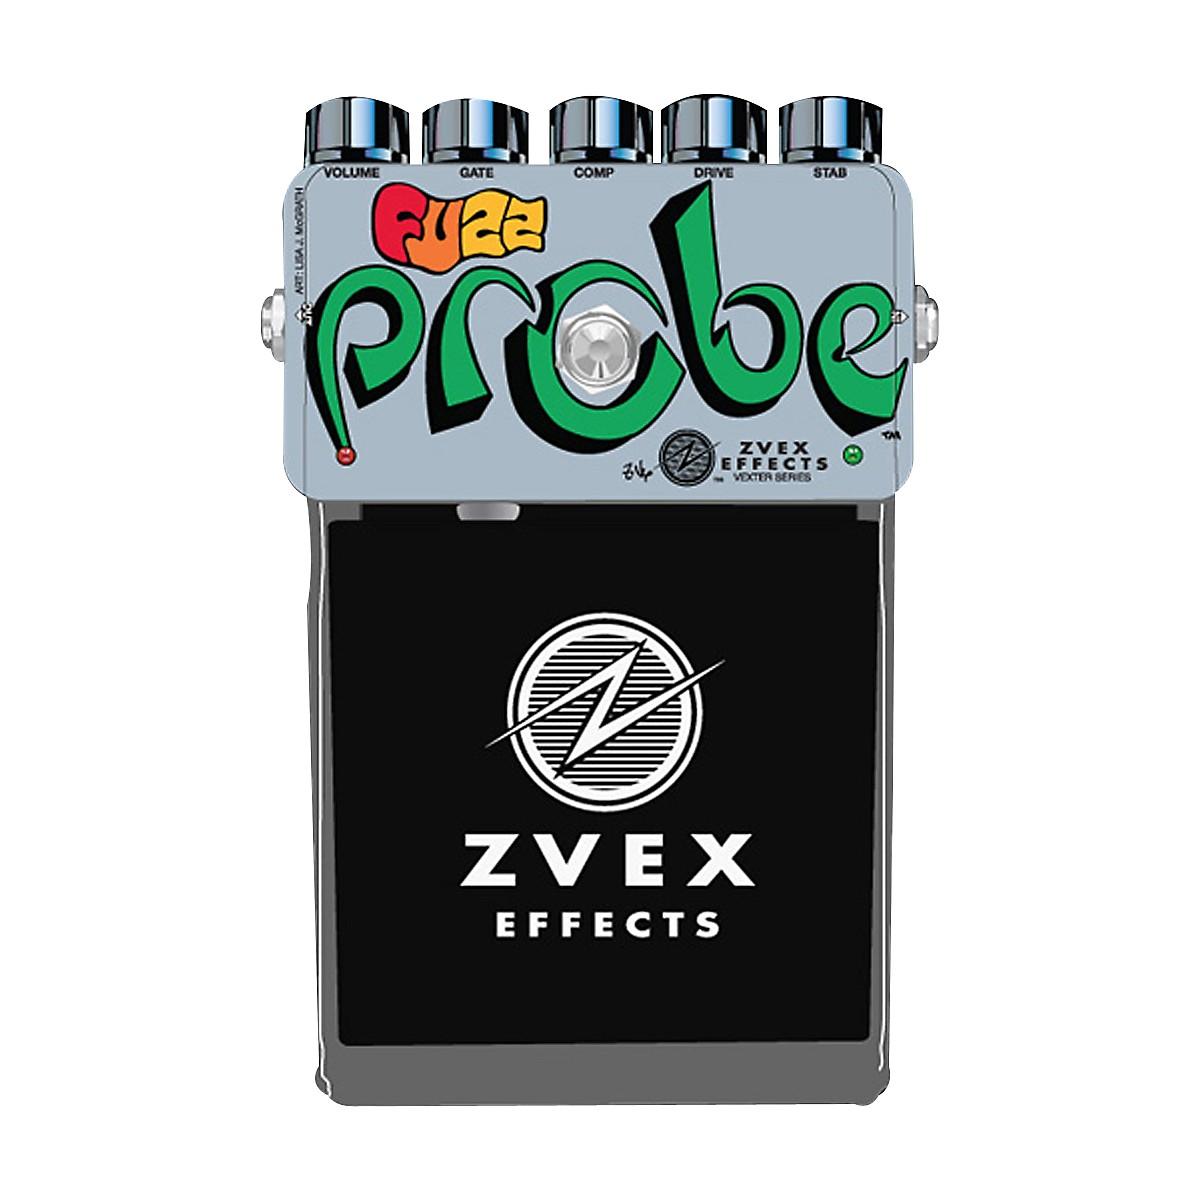 ZVex Vexter Series Fuzz Probe Guitar Effects Pedal